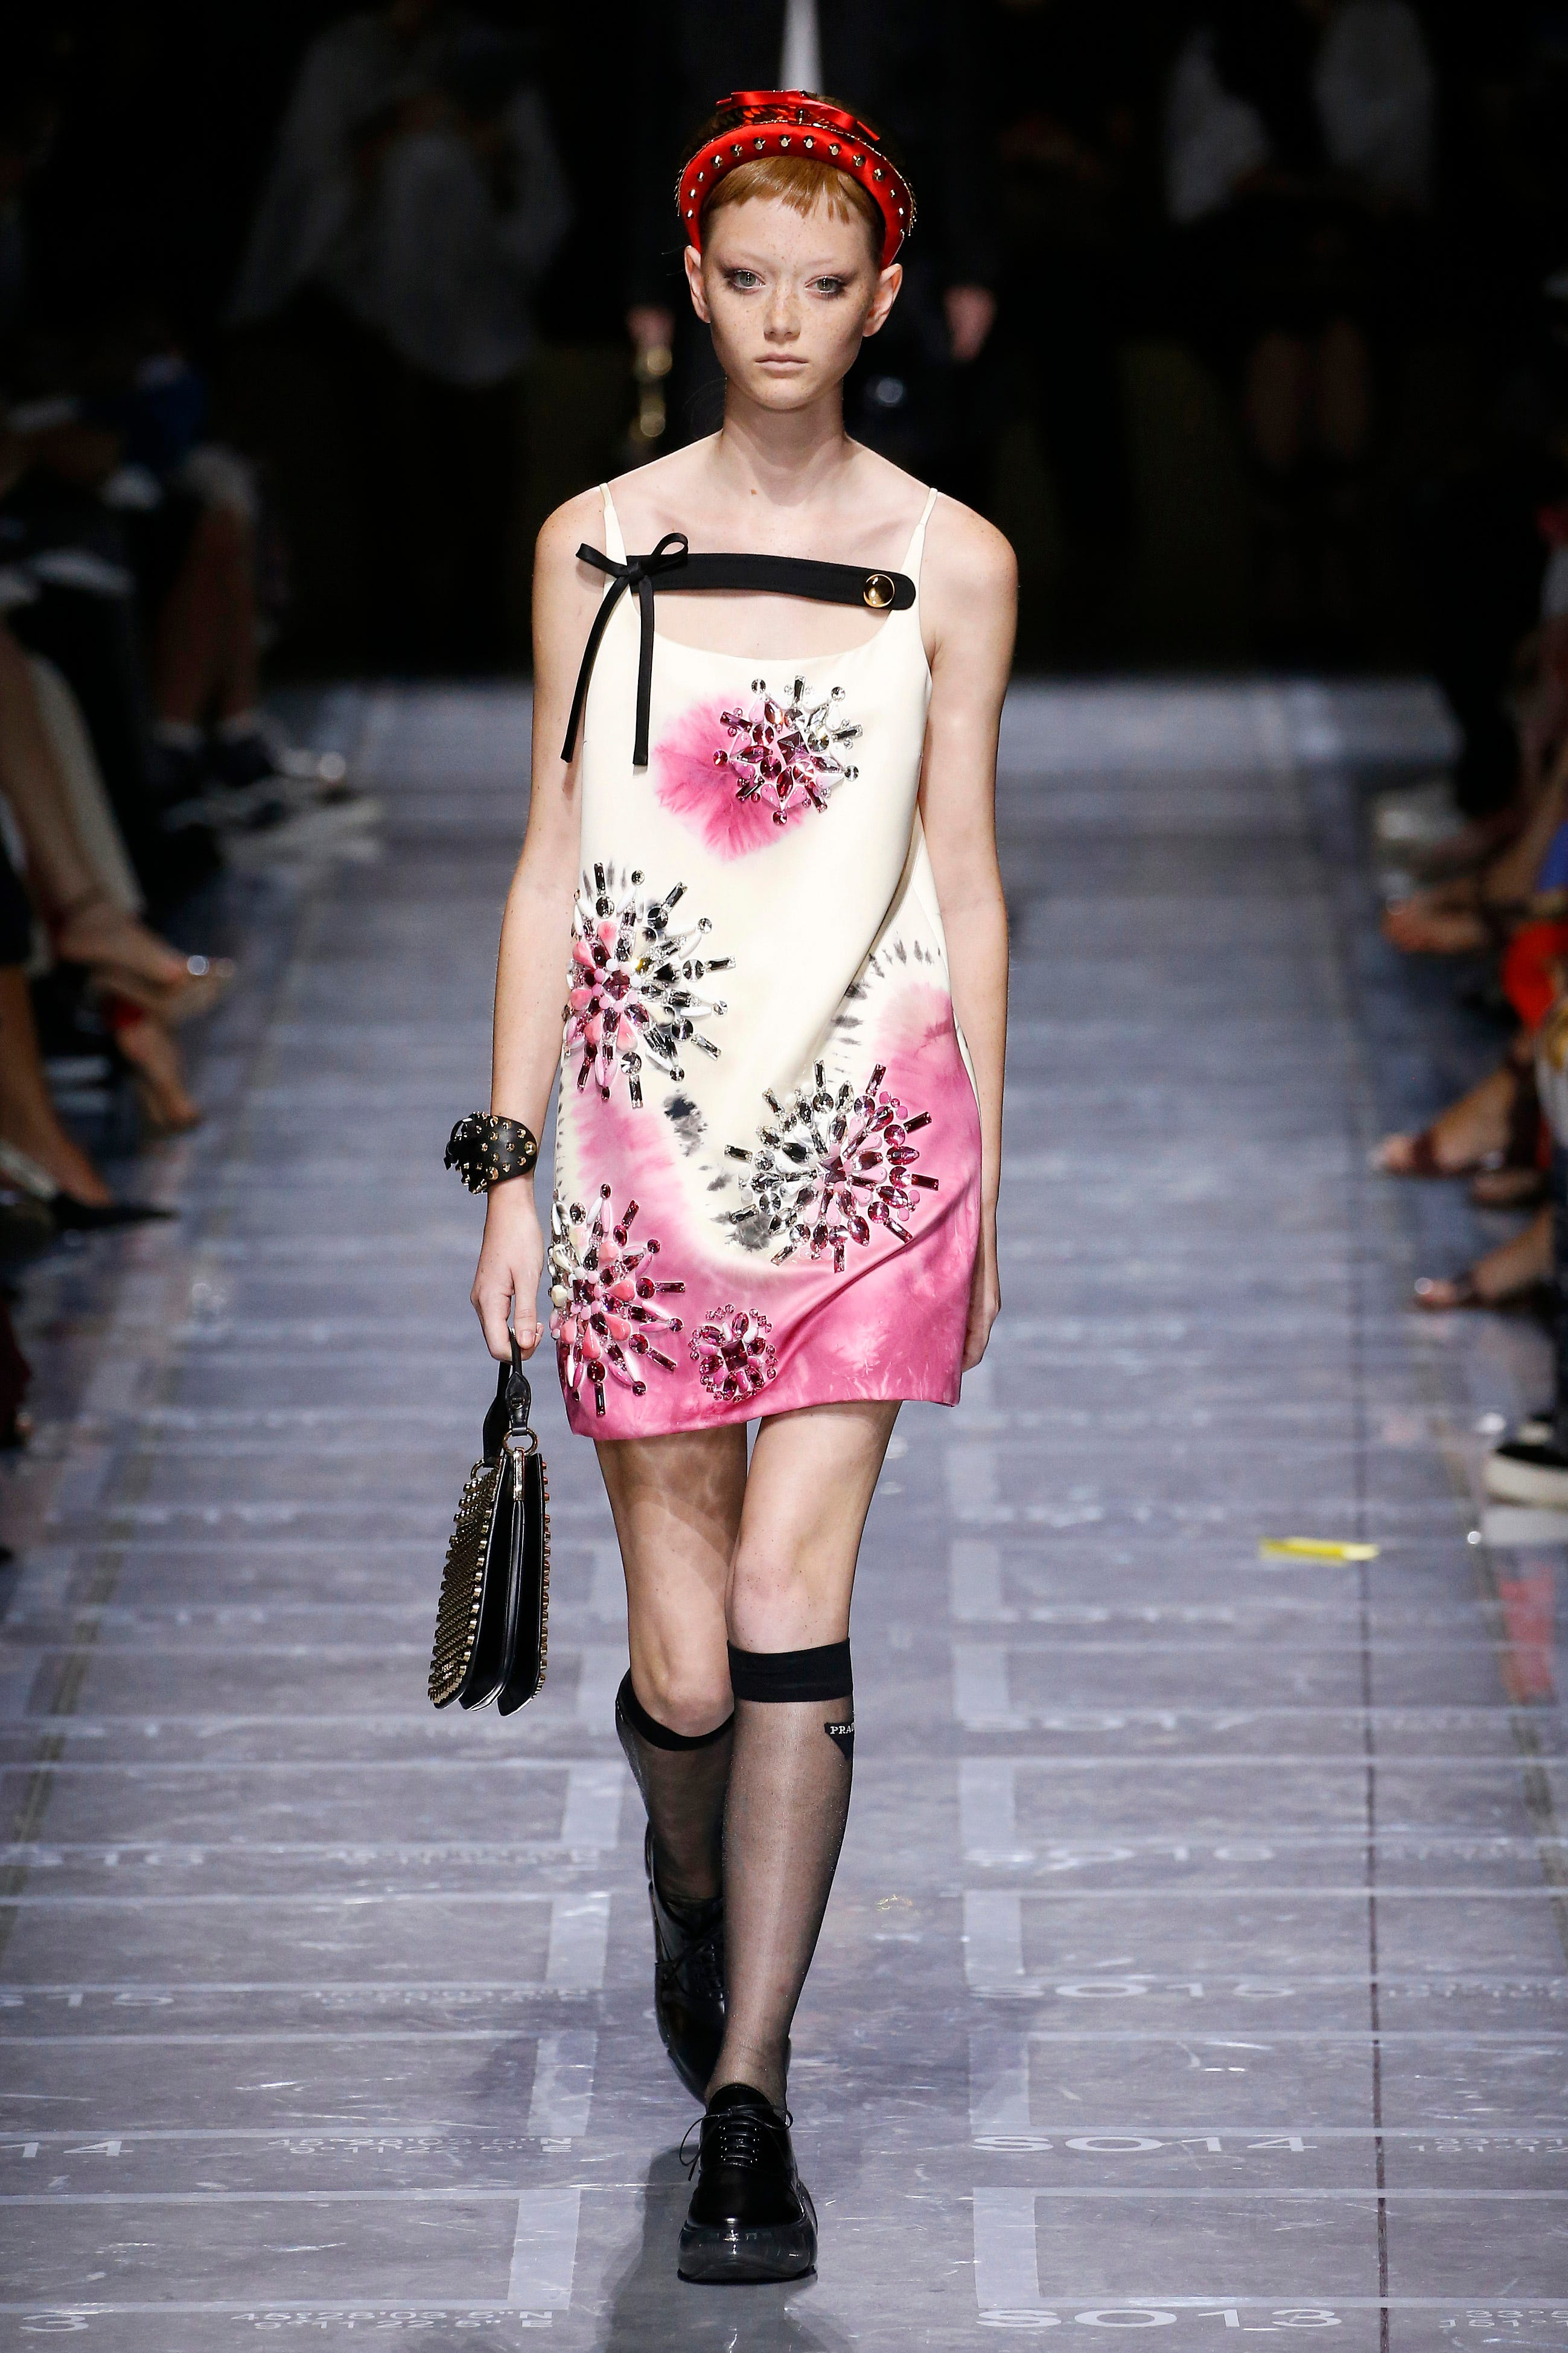 Prada Spring Summer Fashion Week Architect 2019 Show